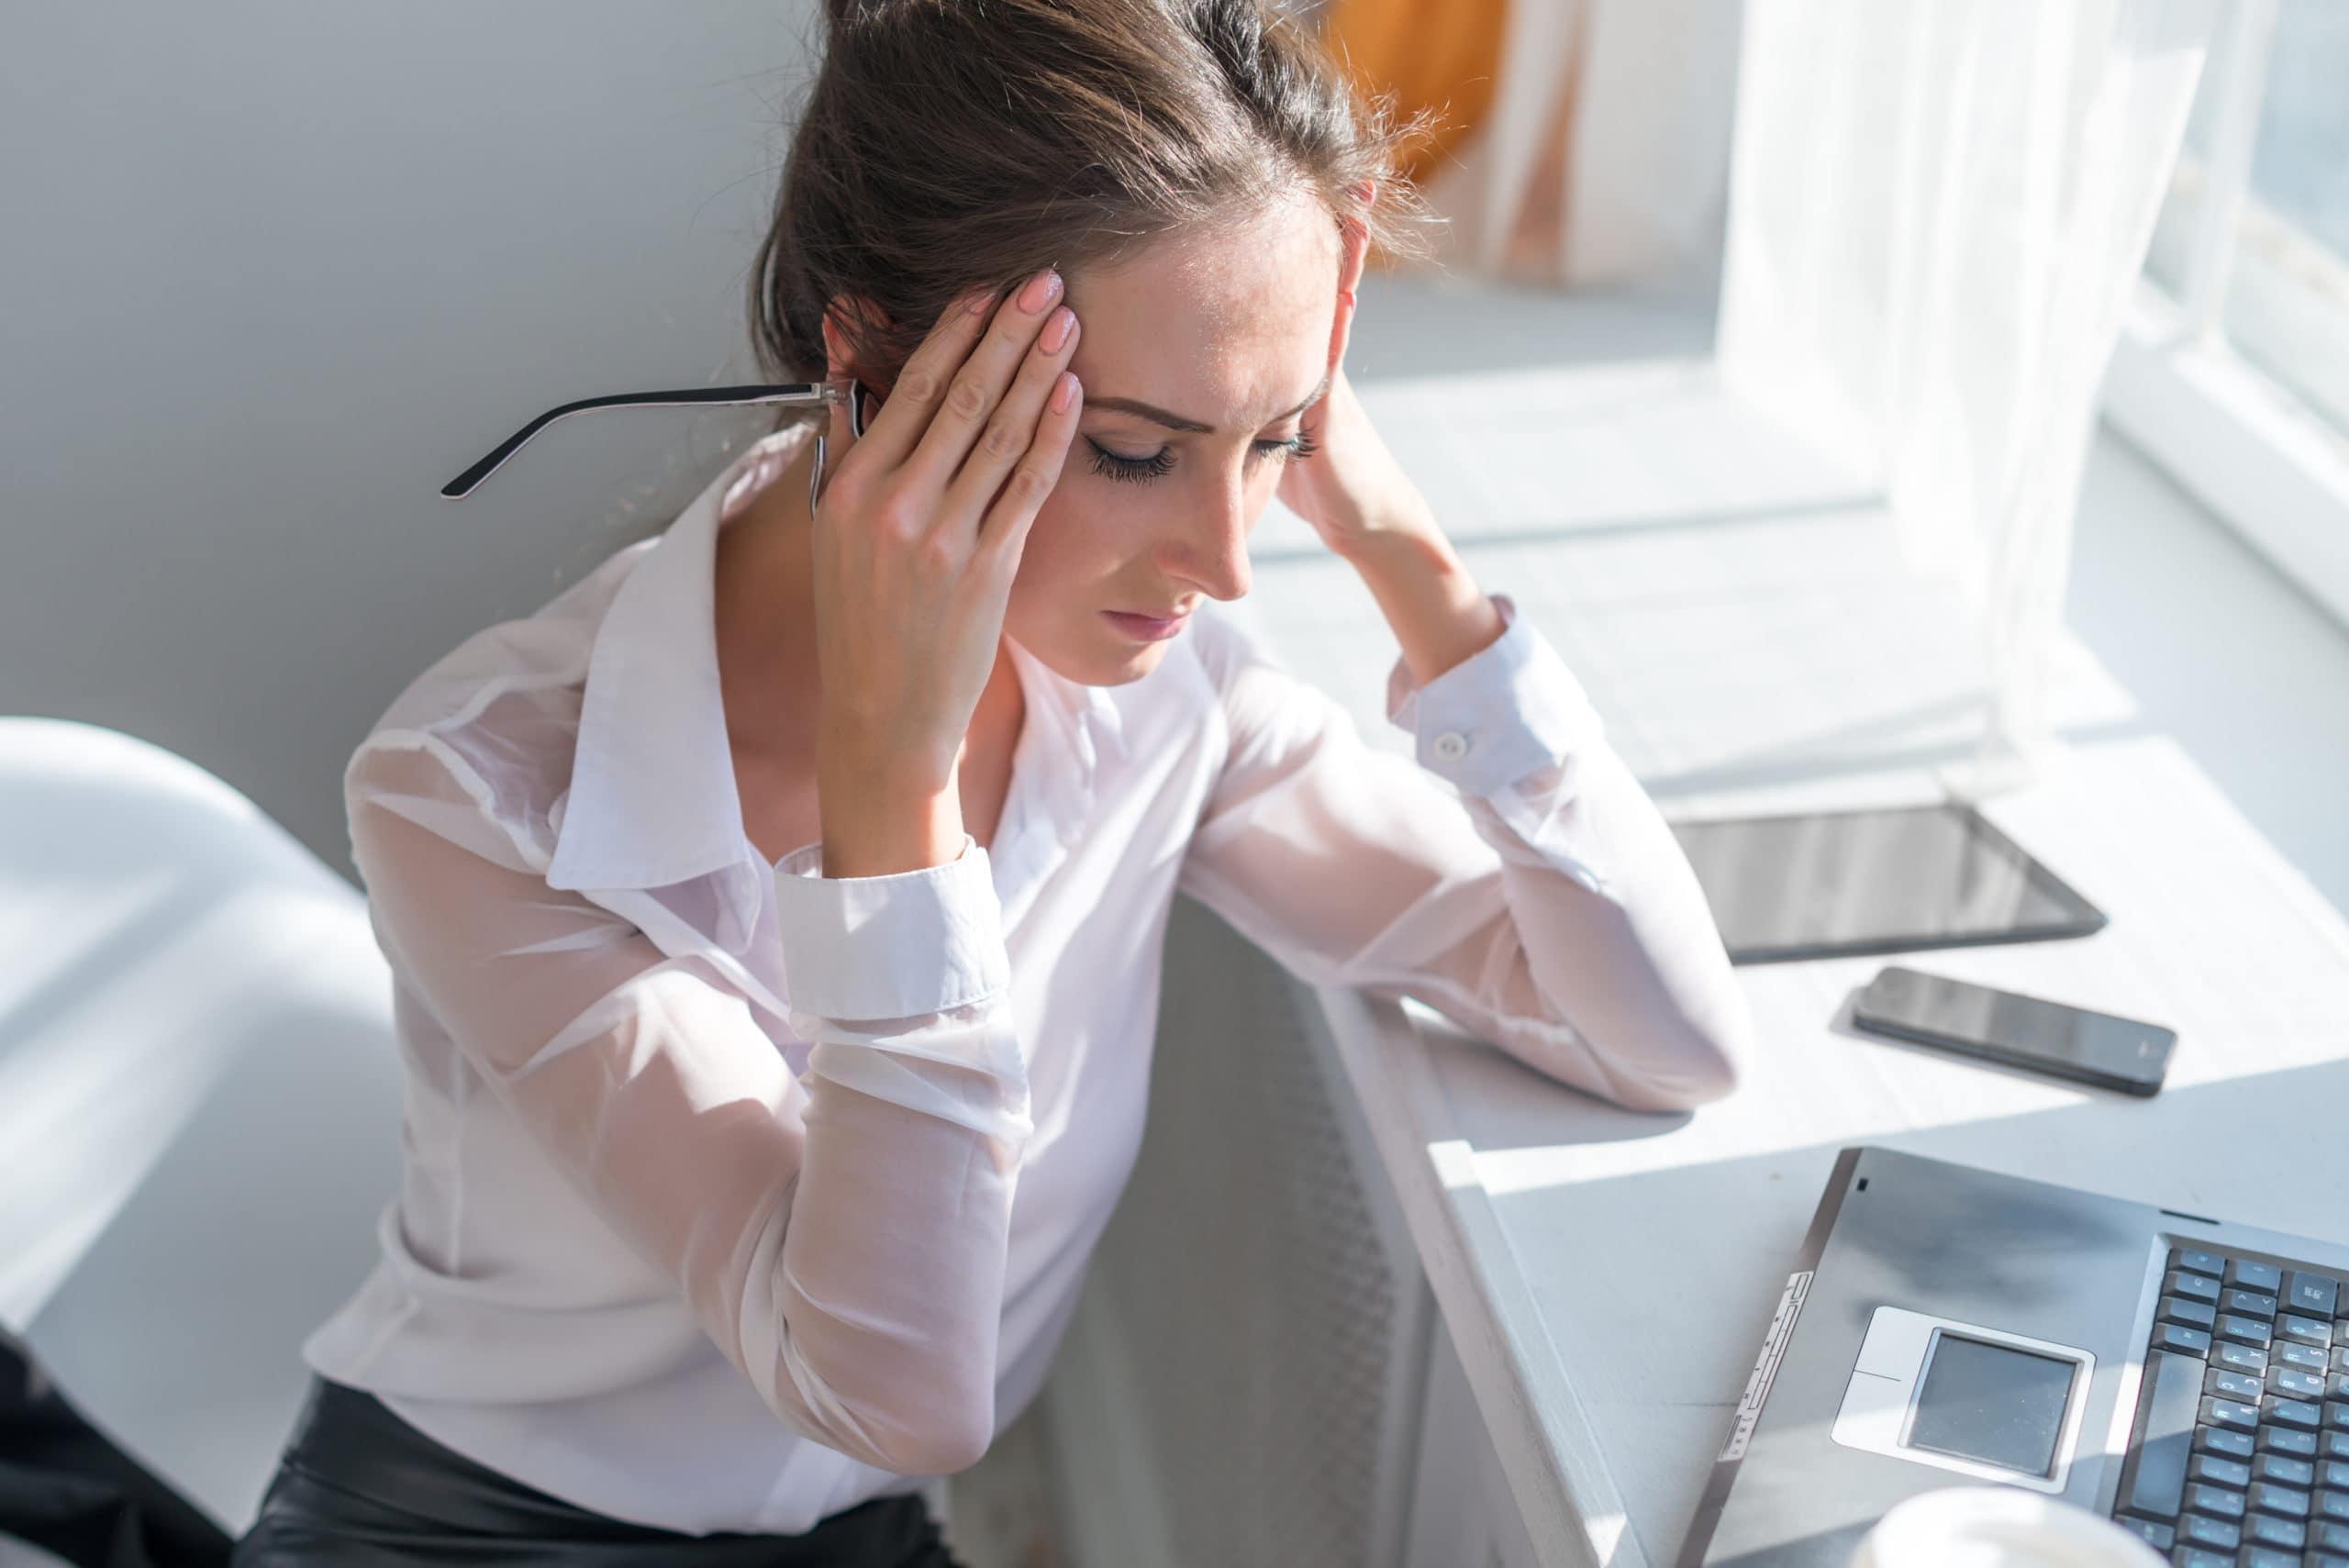 Symptoms Of A Tension Headache